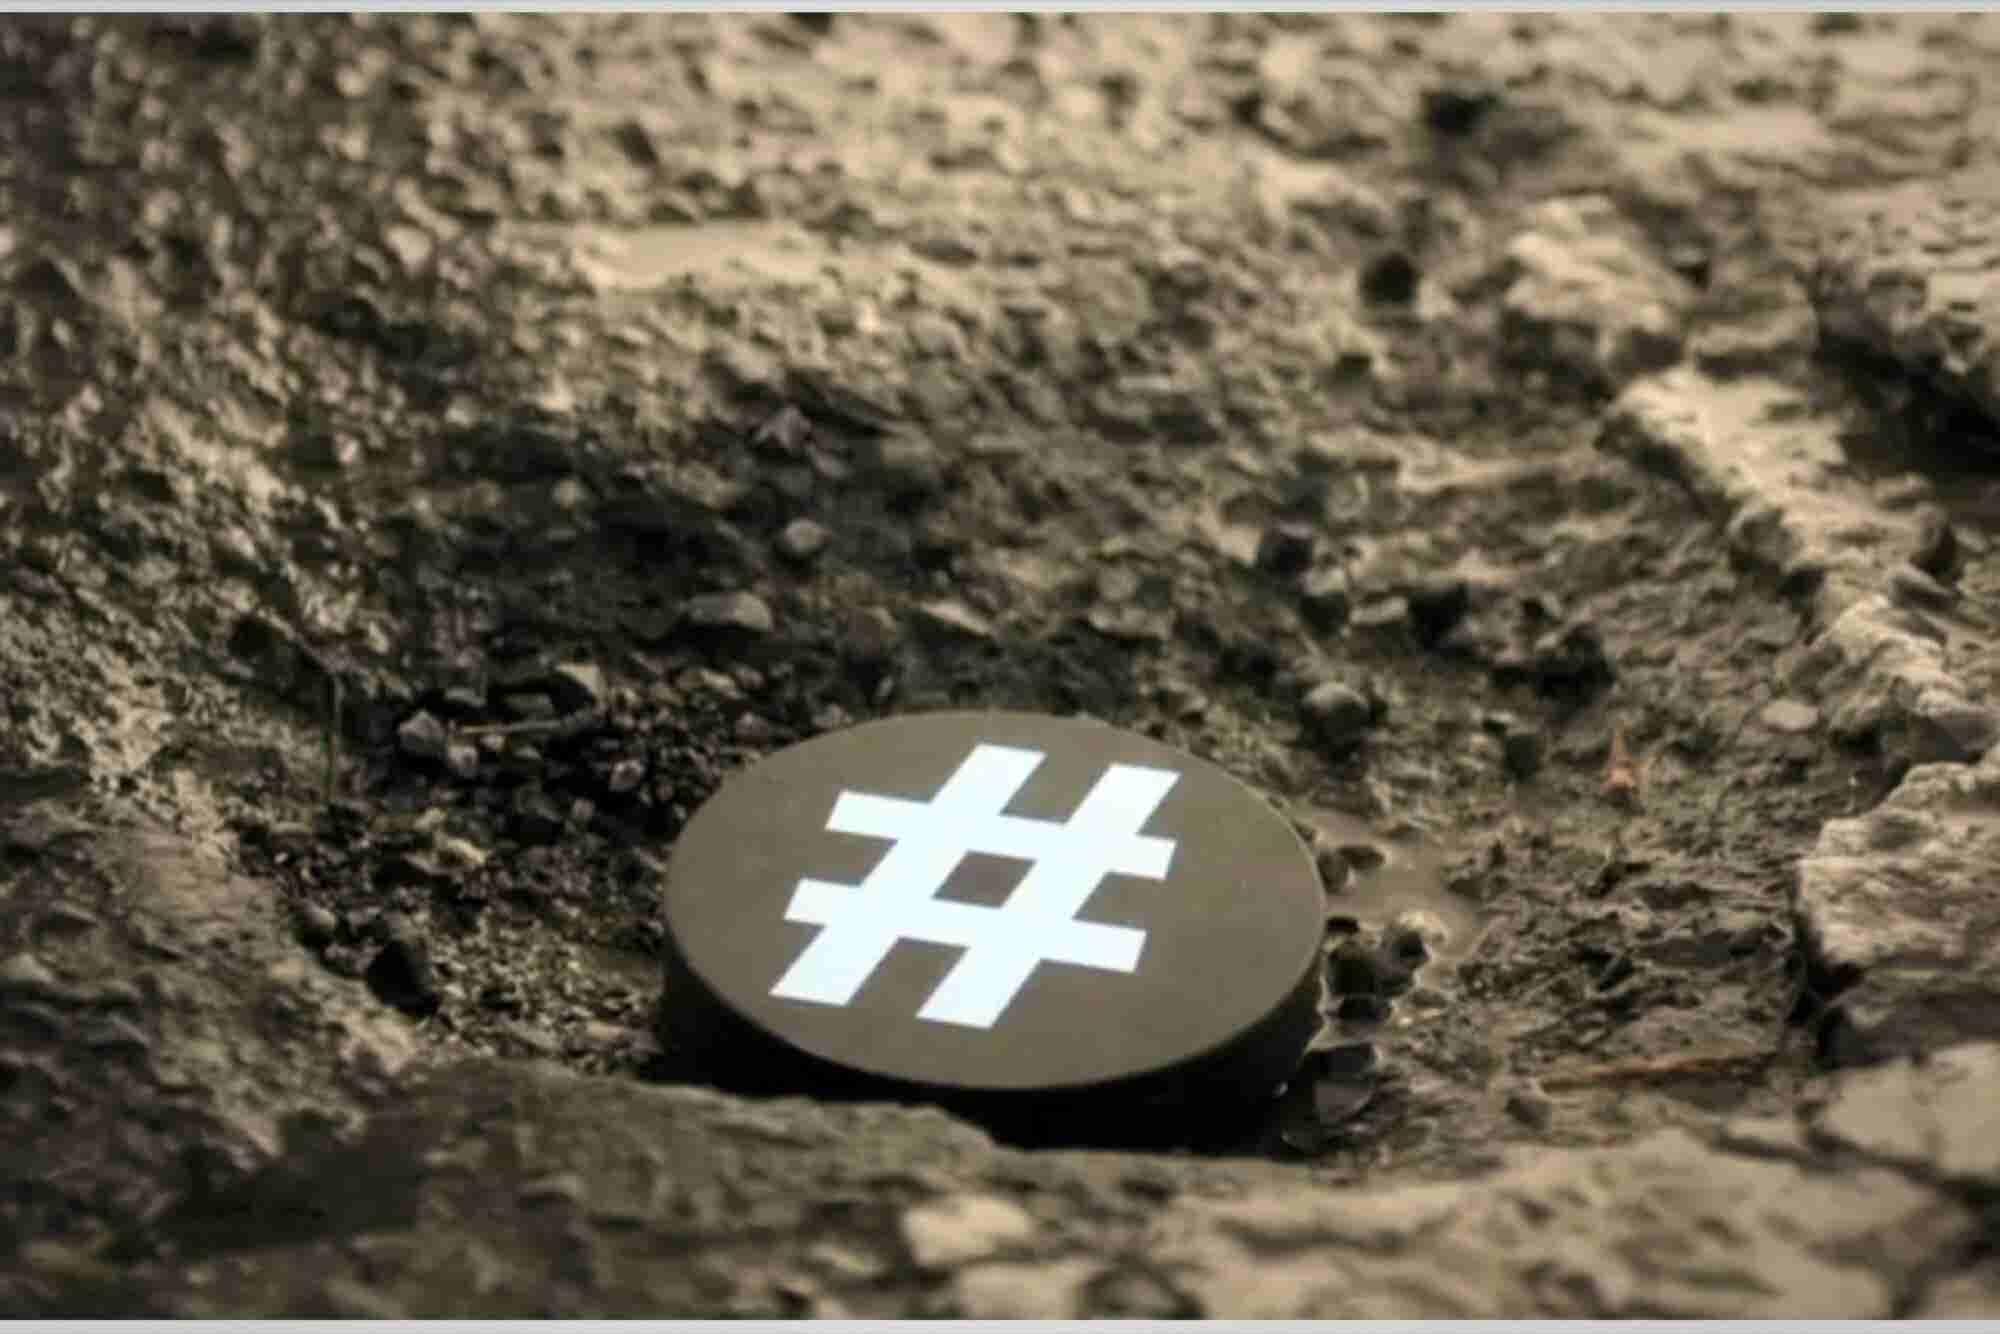 The Genius Solution to One City's Pavement Problem: Make the Potholes Tweet